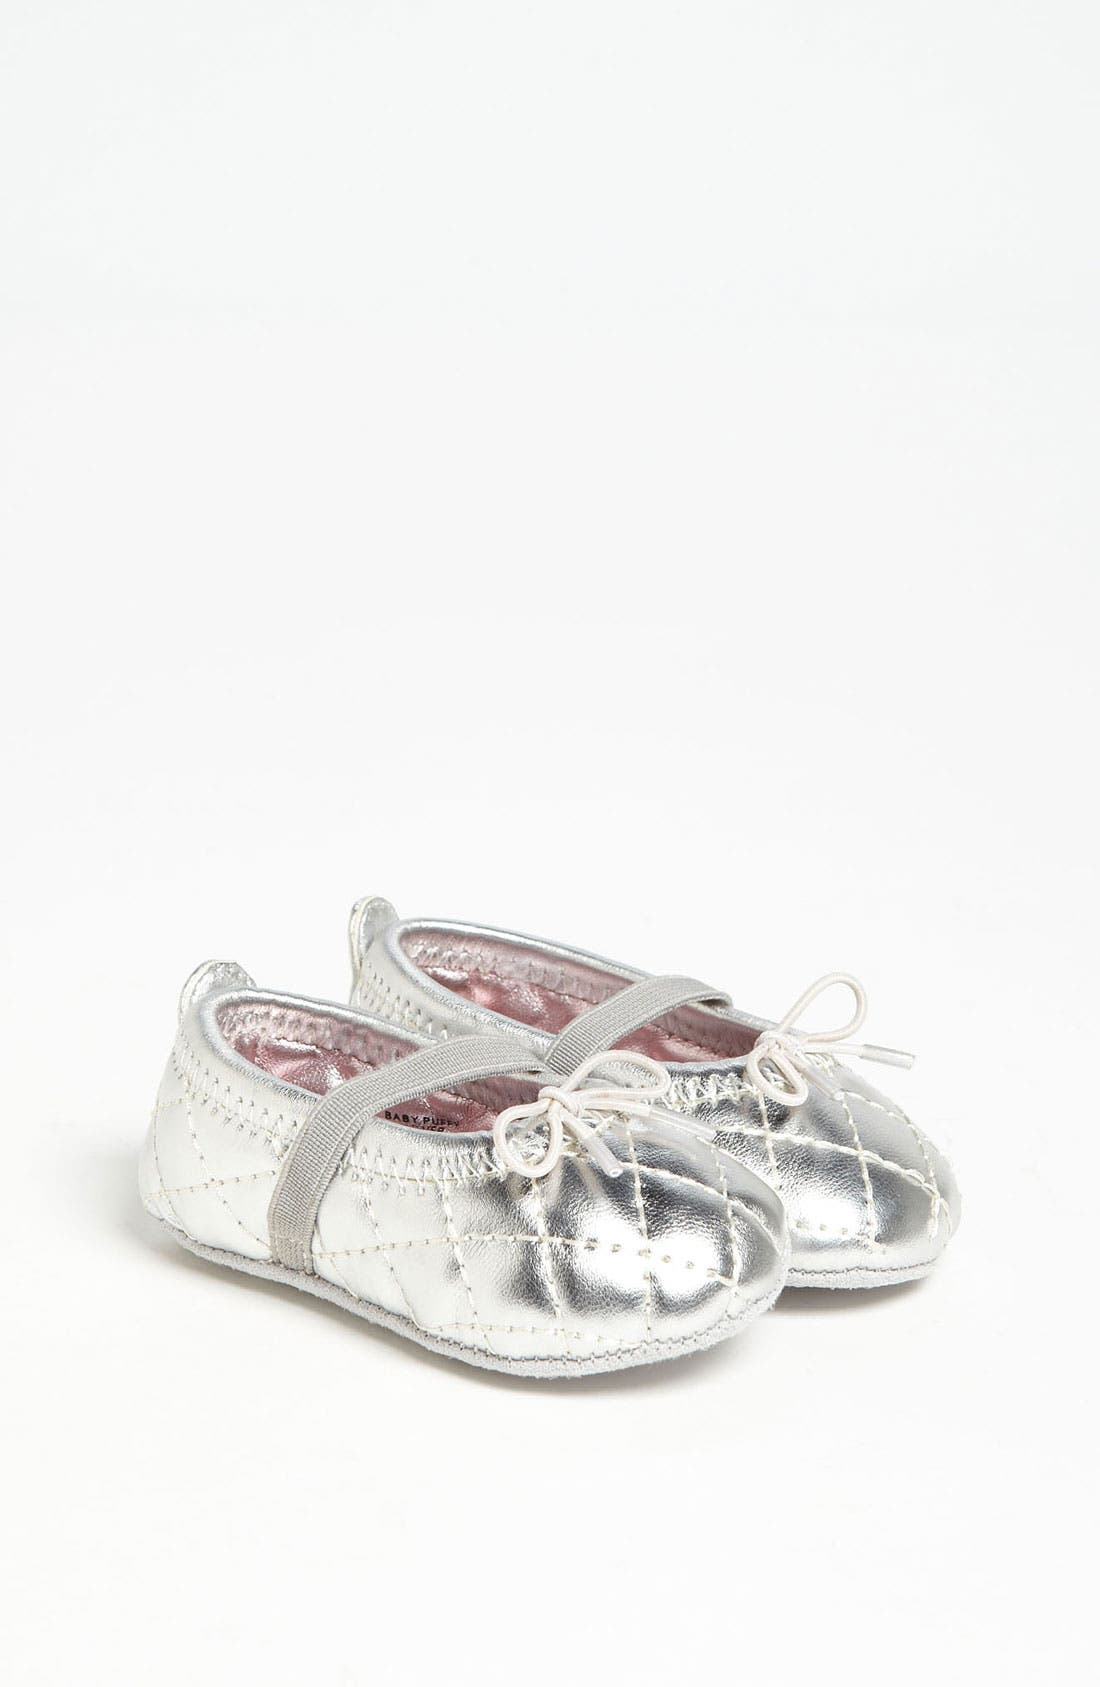 Alternate Image 1 Selected - Stuart Weitzman 'Baby Puffy' Crib Shoe (Baby)